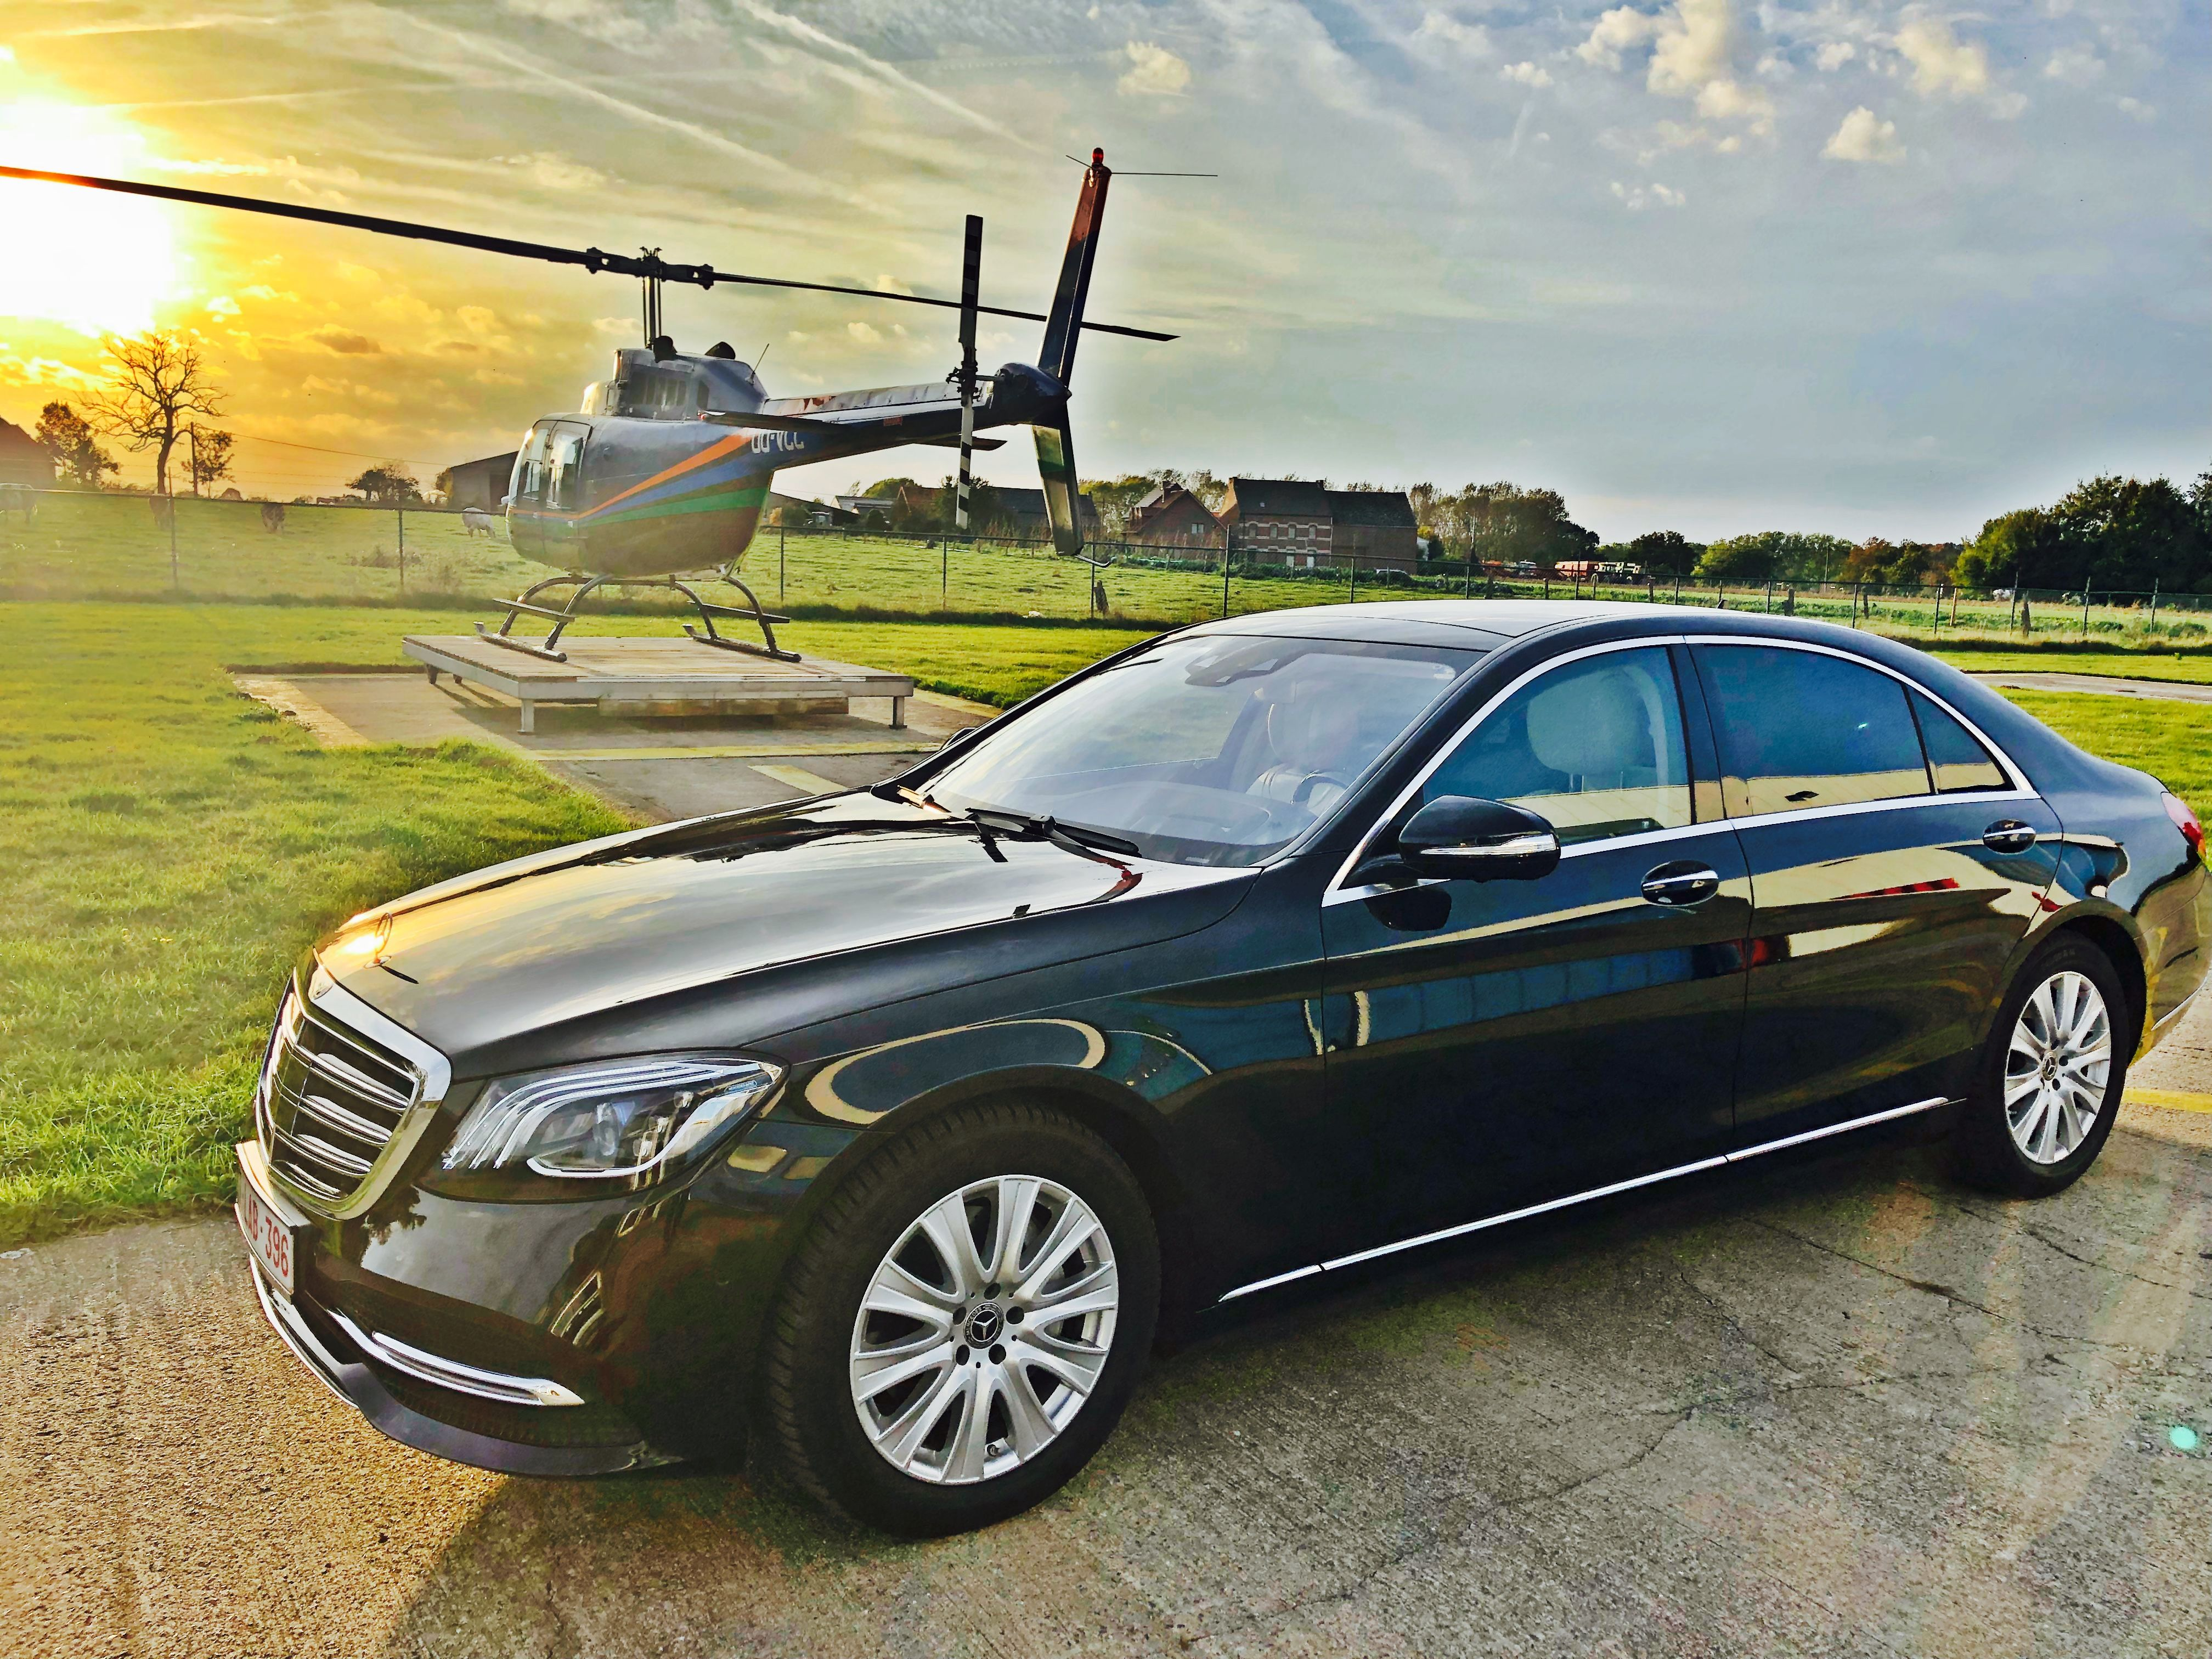 luxury chauffeured cars in brussels luxury chauffeured cars in brussels